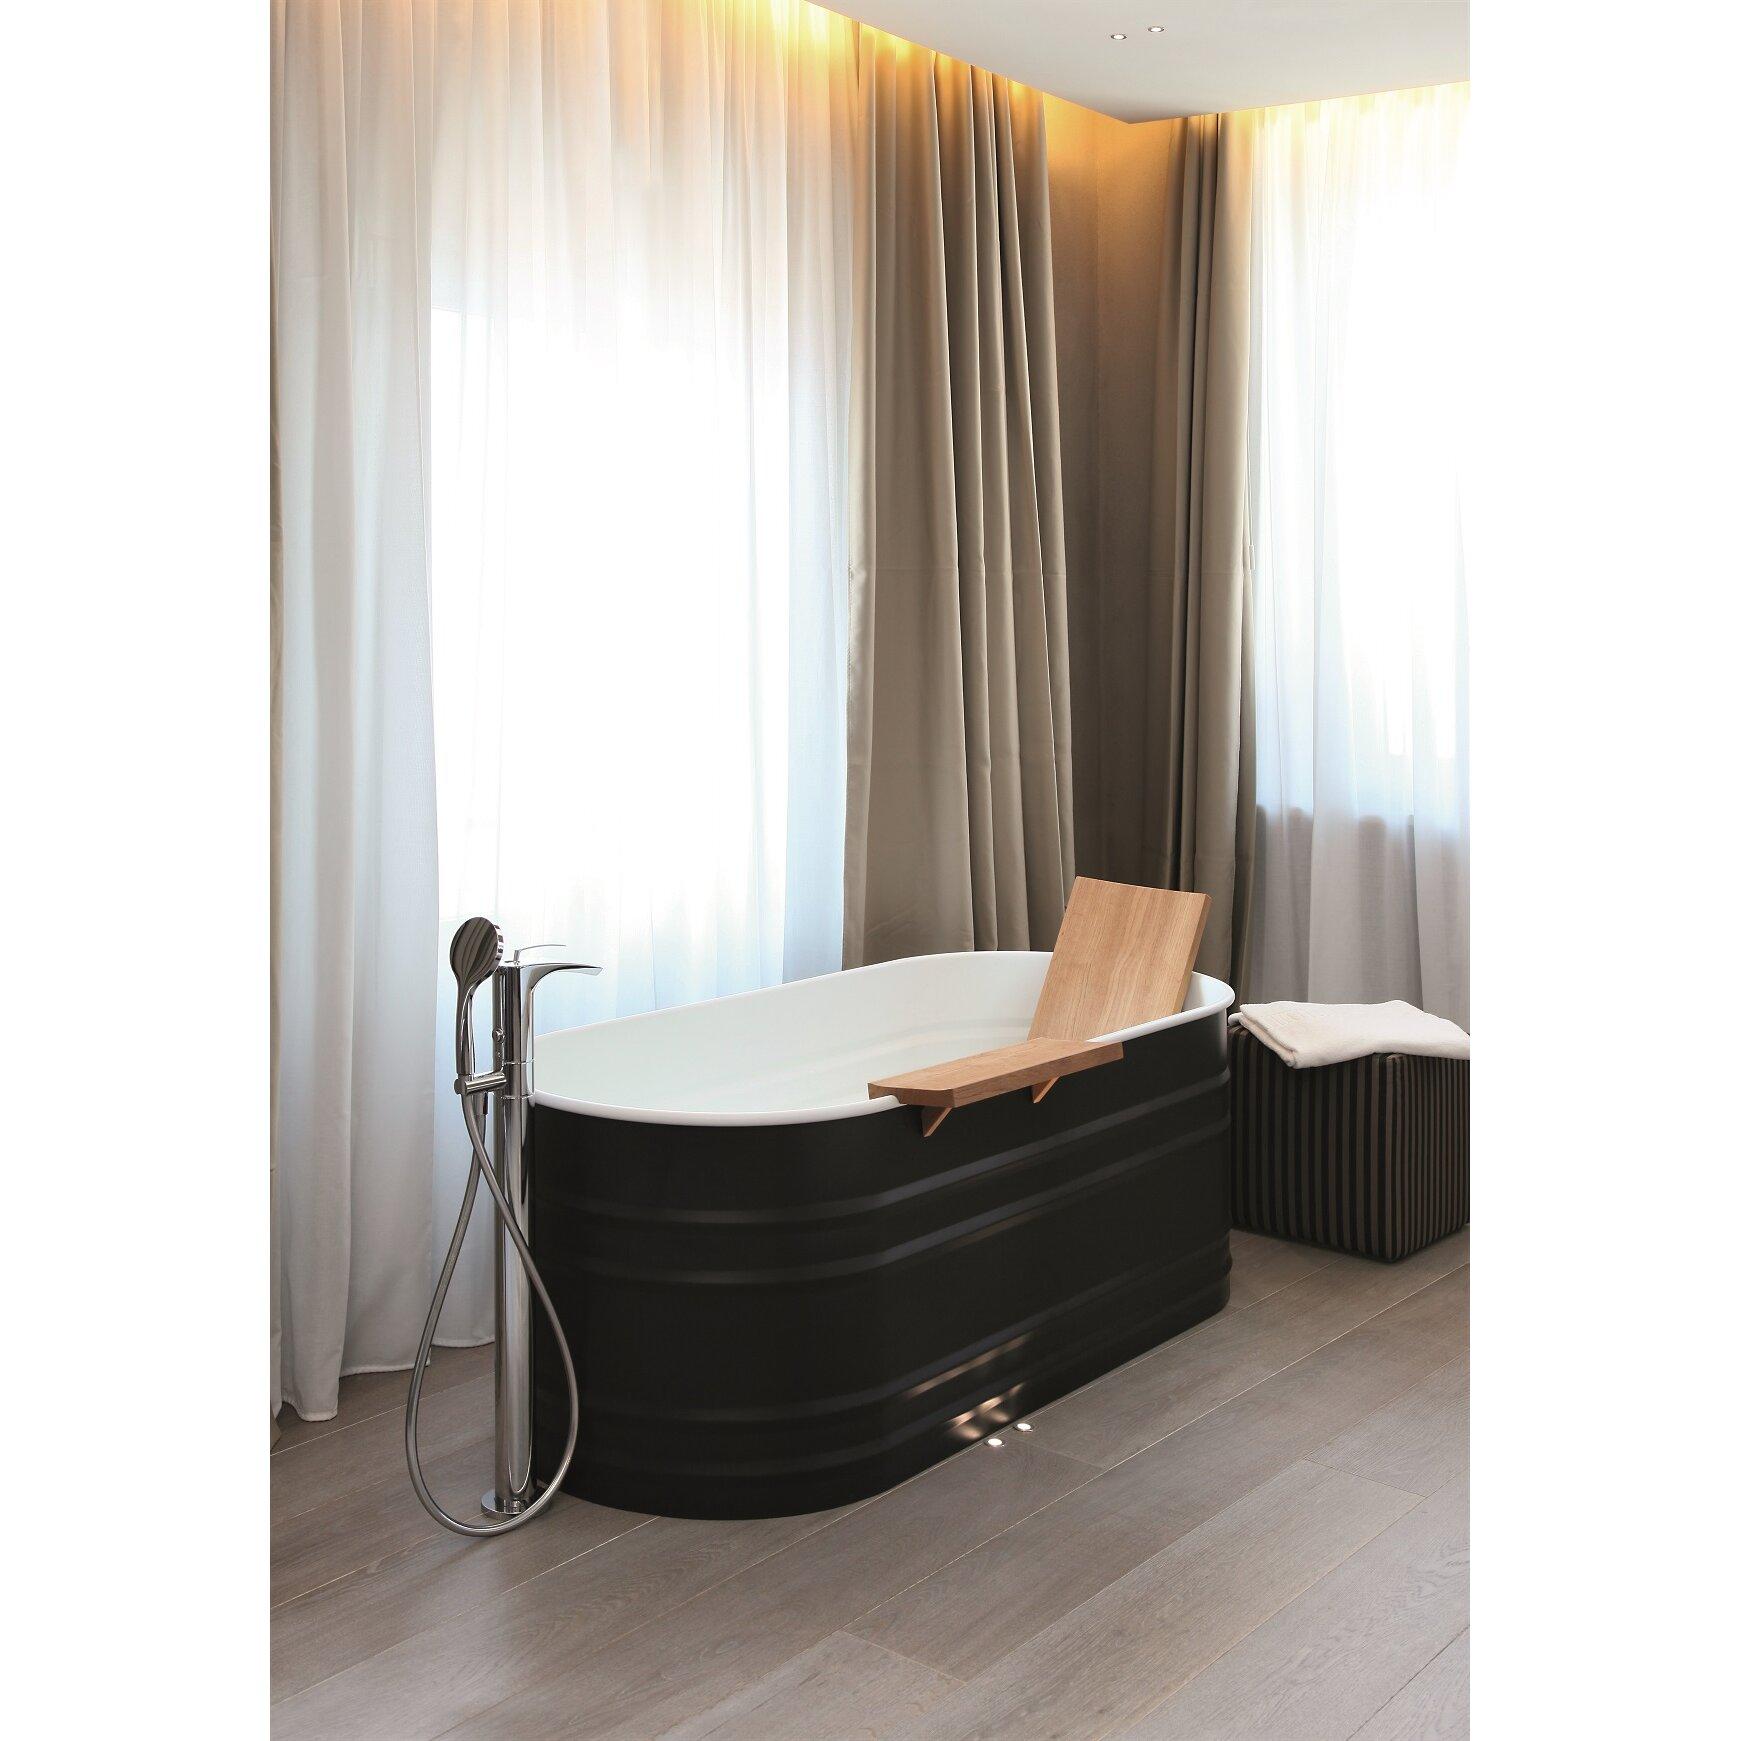 aquatica bollicine single handle floor mount bath faucet kokols brushed nickel waterfall roman bath tub faucet